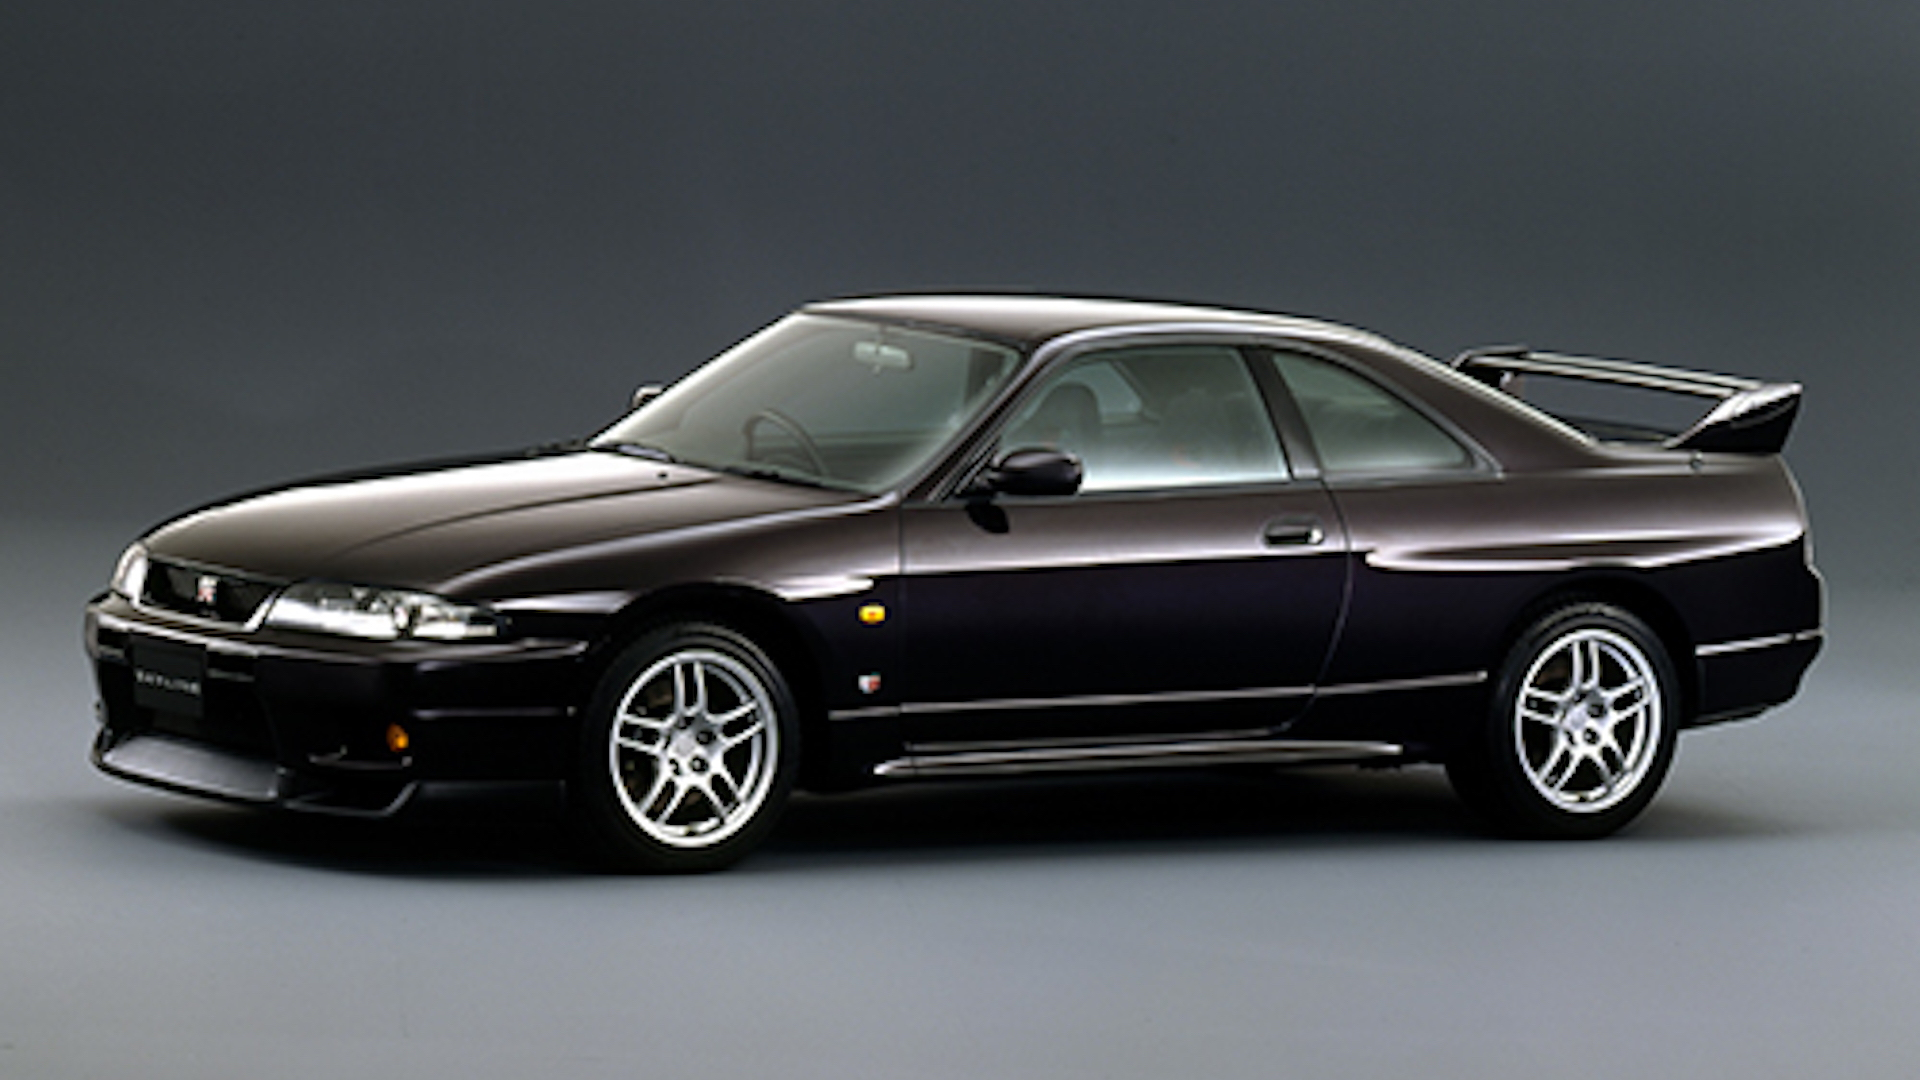 Nissan R33 Skyline GT-R